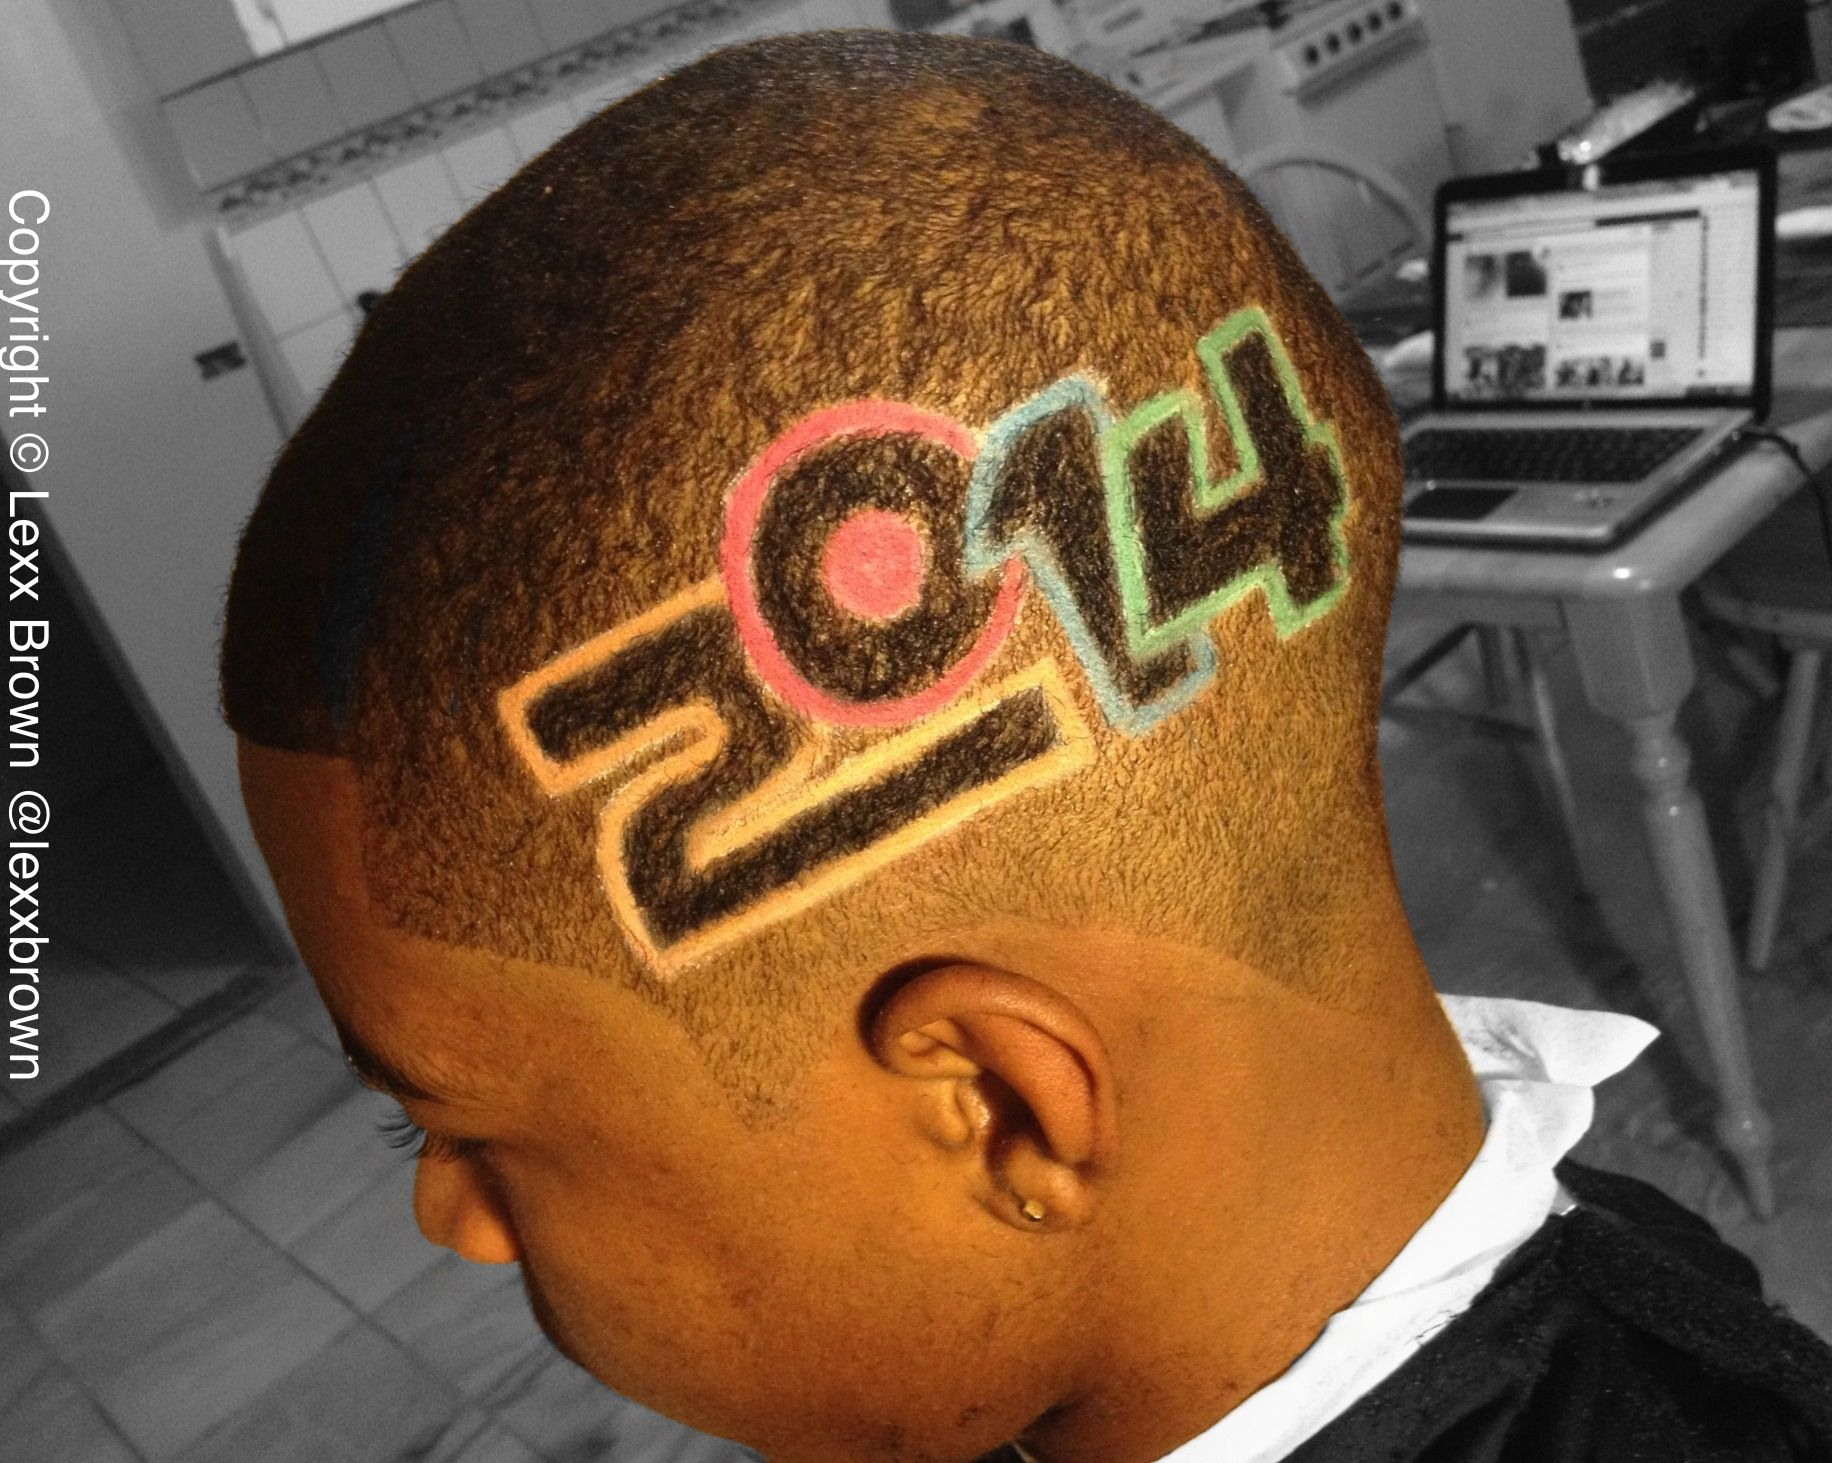 kuts by #lexxbrown #3d #hair #hairart #haircut #hairstyle